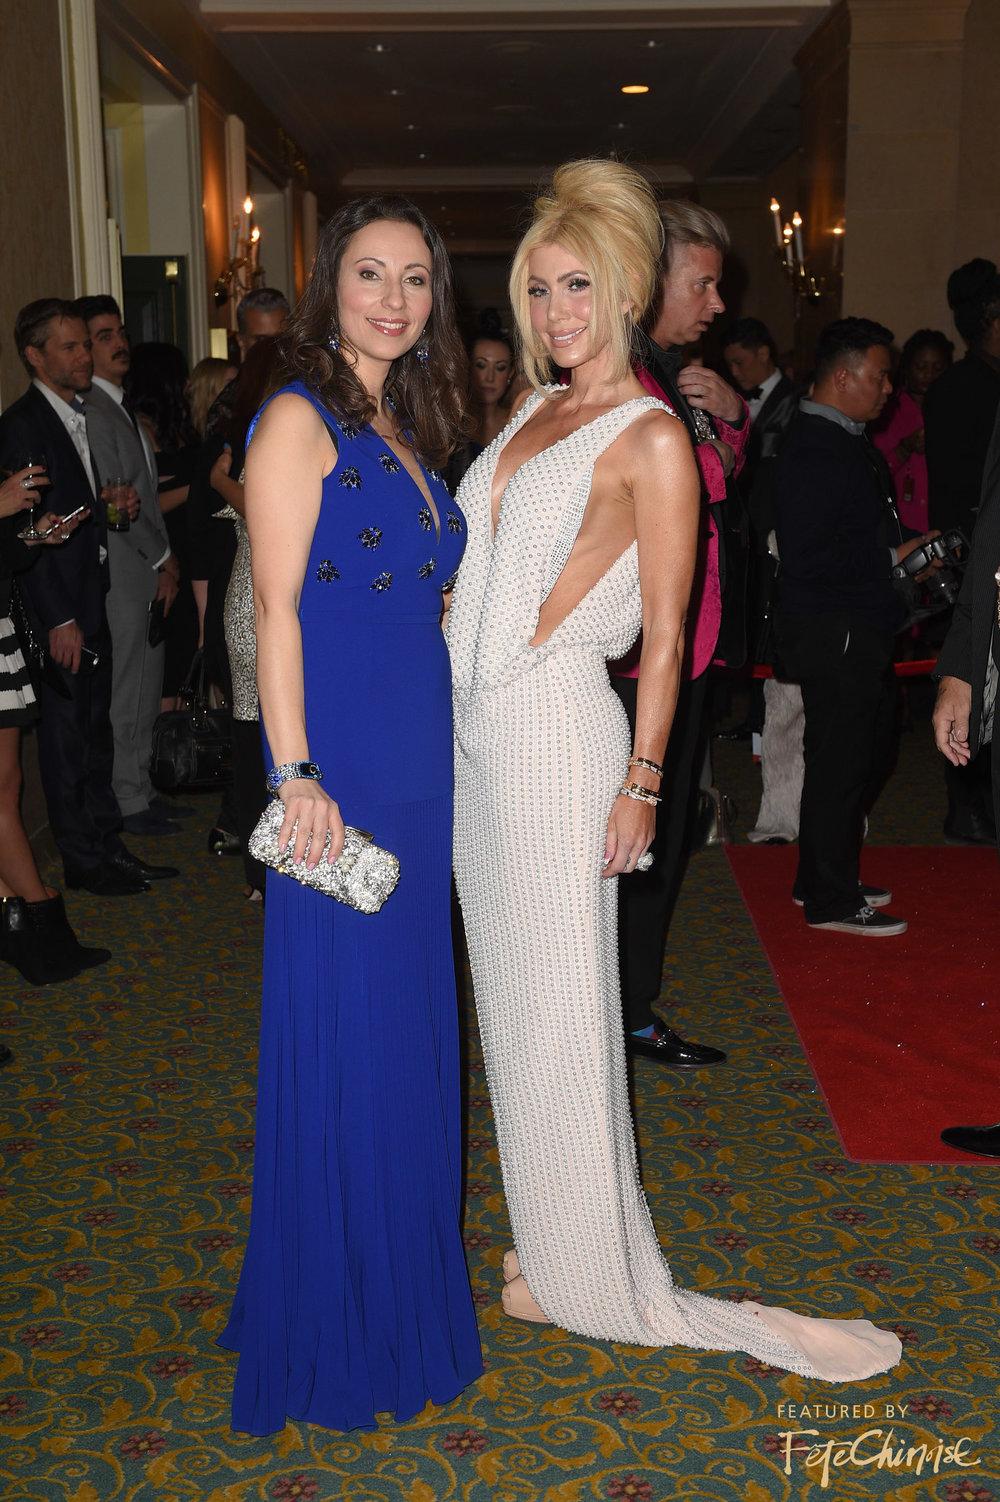 Vicky Milner and Sylvia Mantella